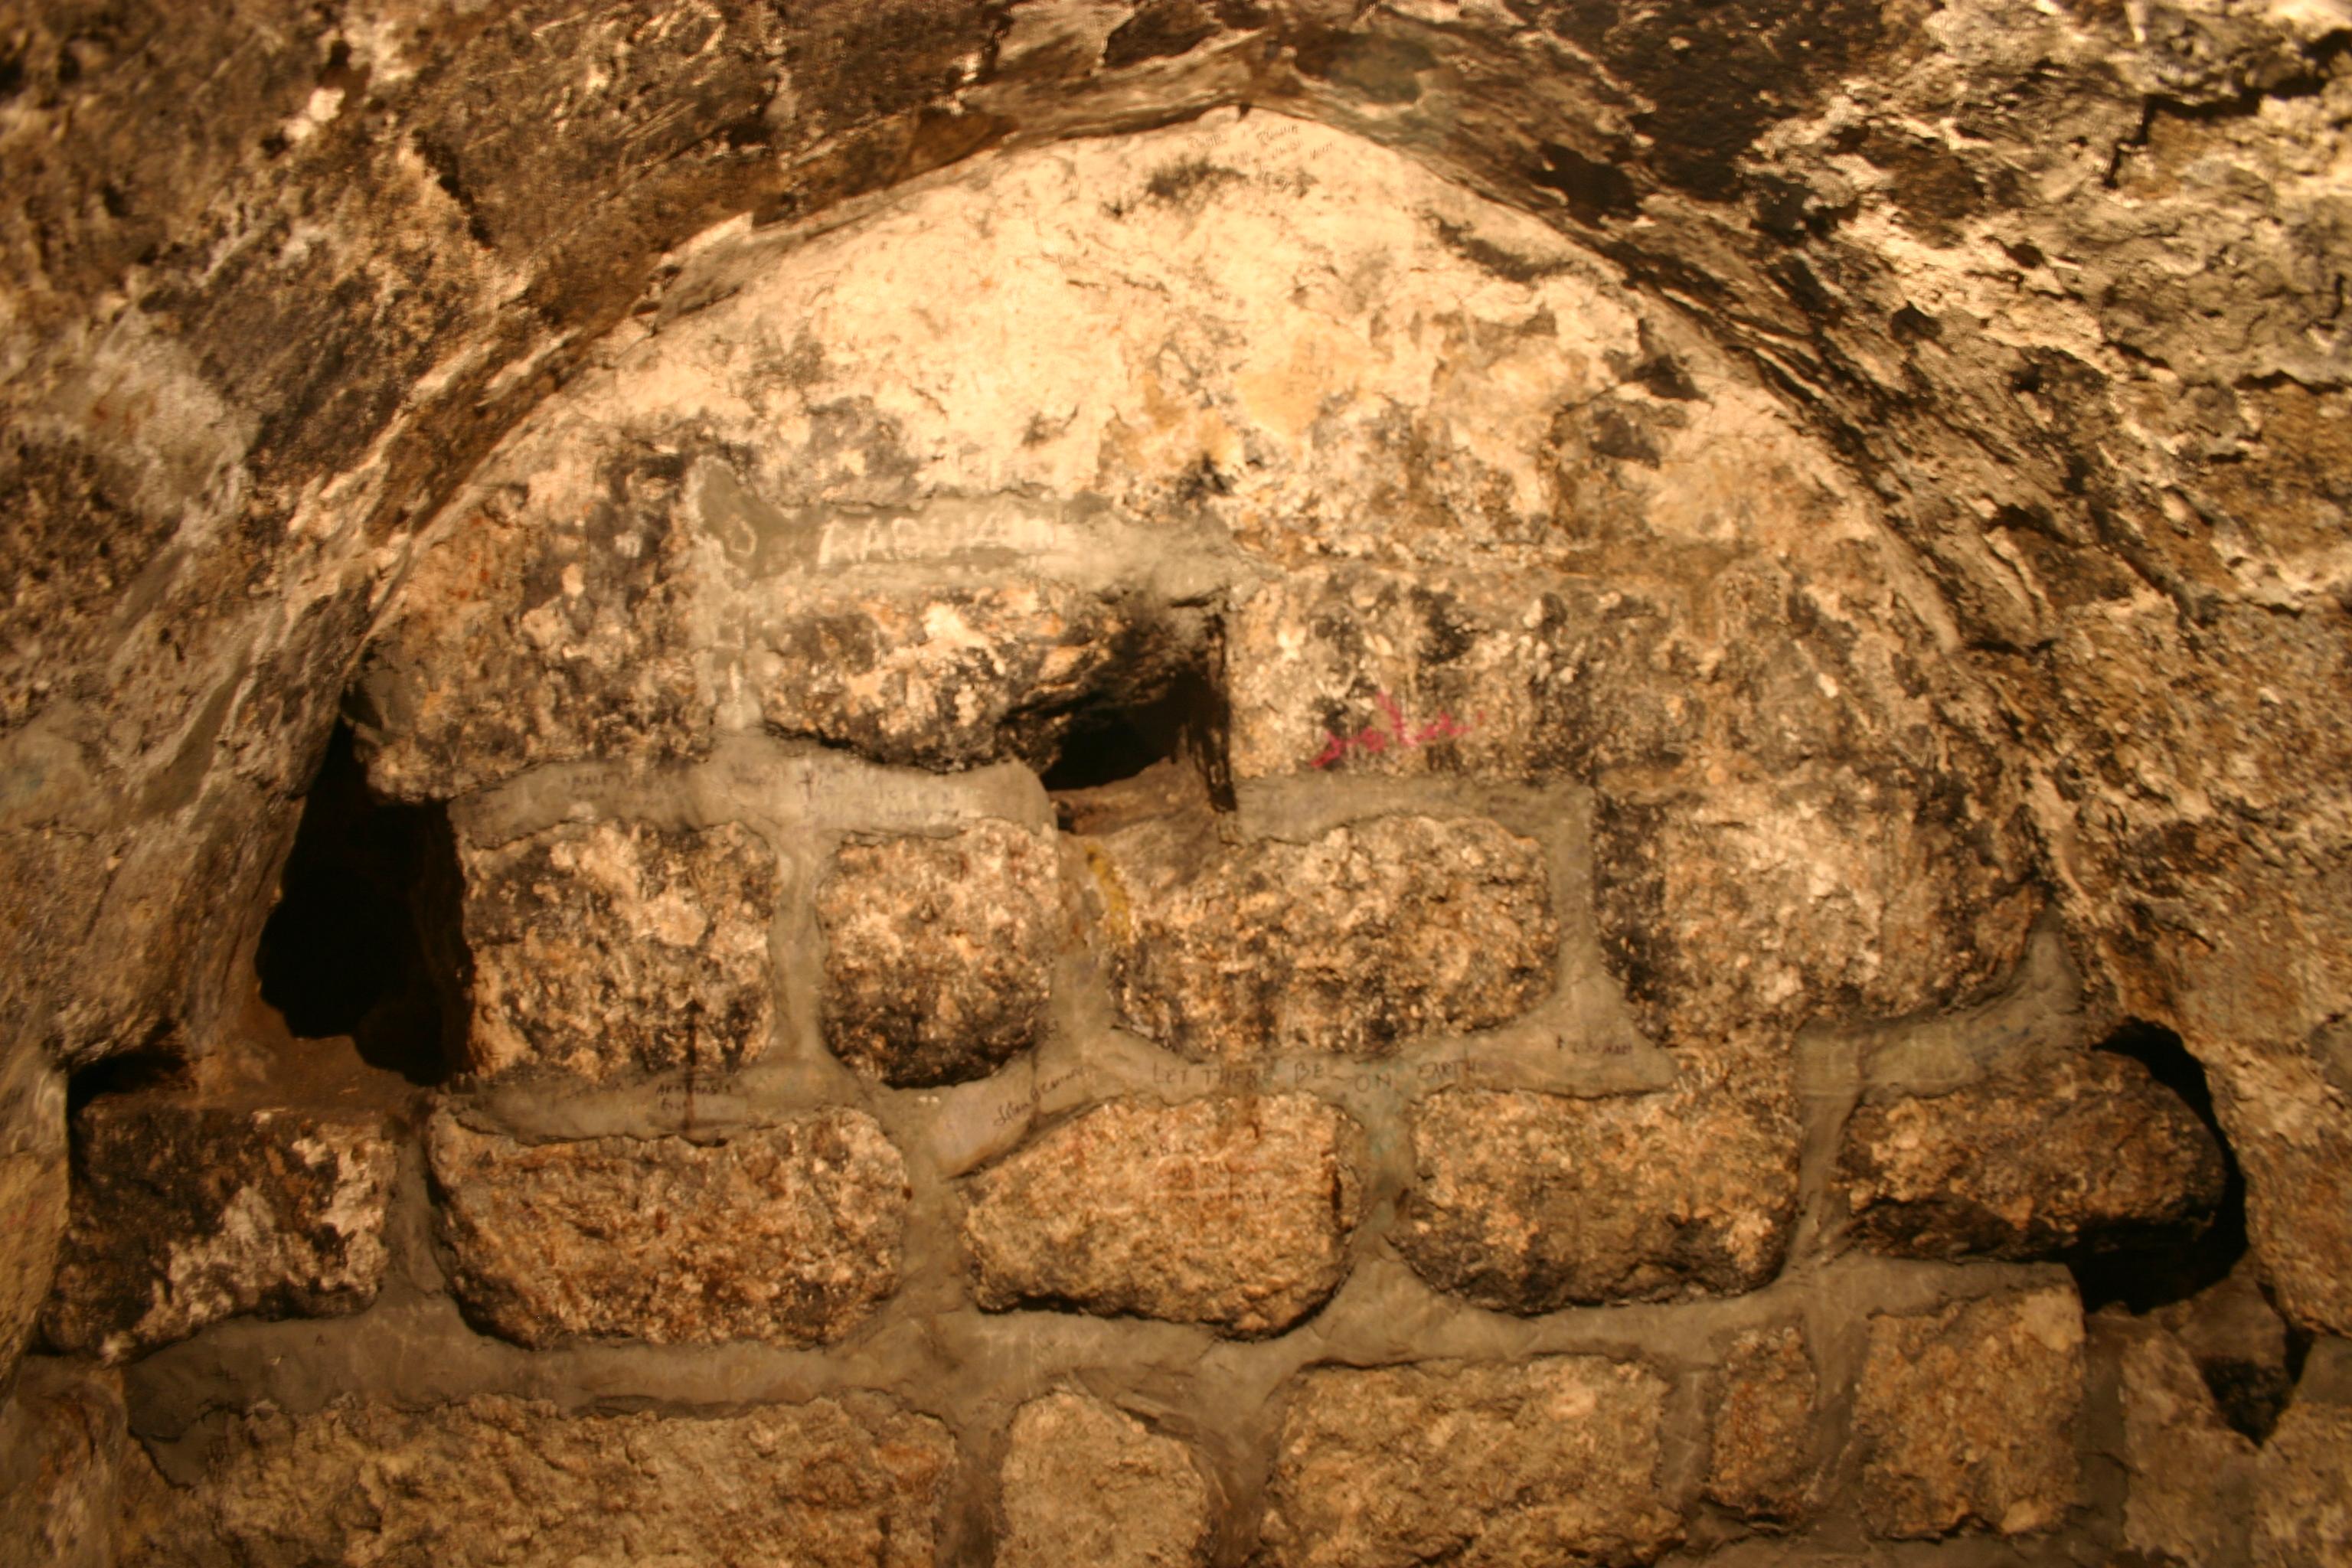 File:Lazarus Tomb Bethany 2006 StLee jpeg - Wikimedia Commons